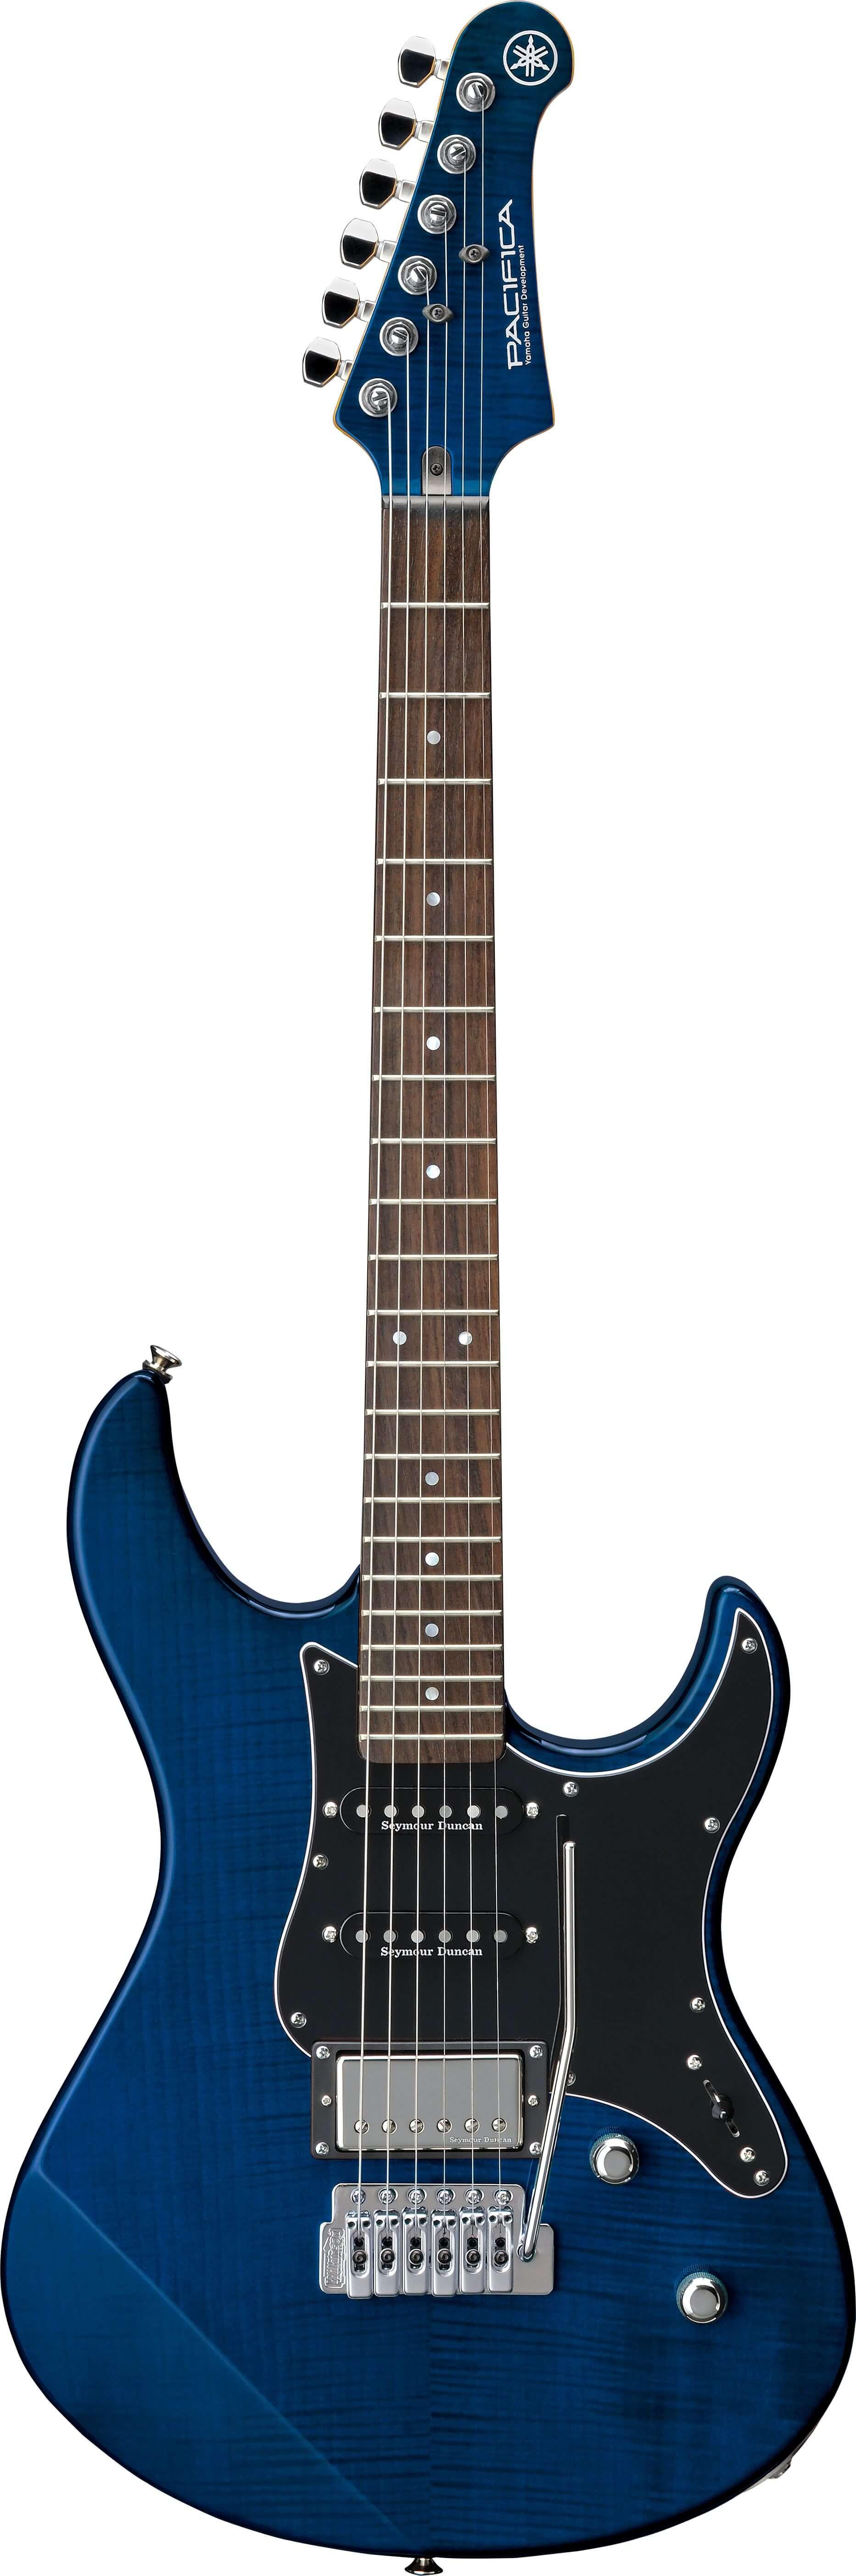 Guitarra Eléctrica Yamaha Pa612Viifm Translucent Blue